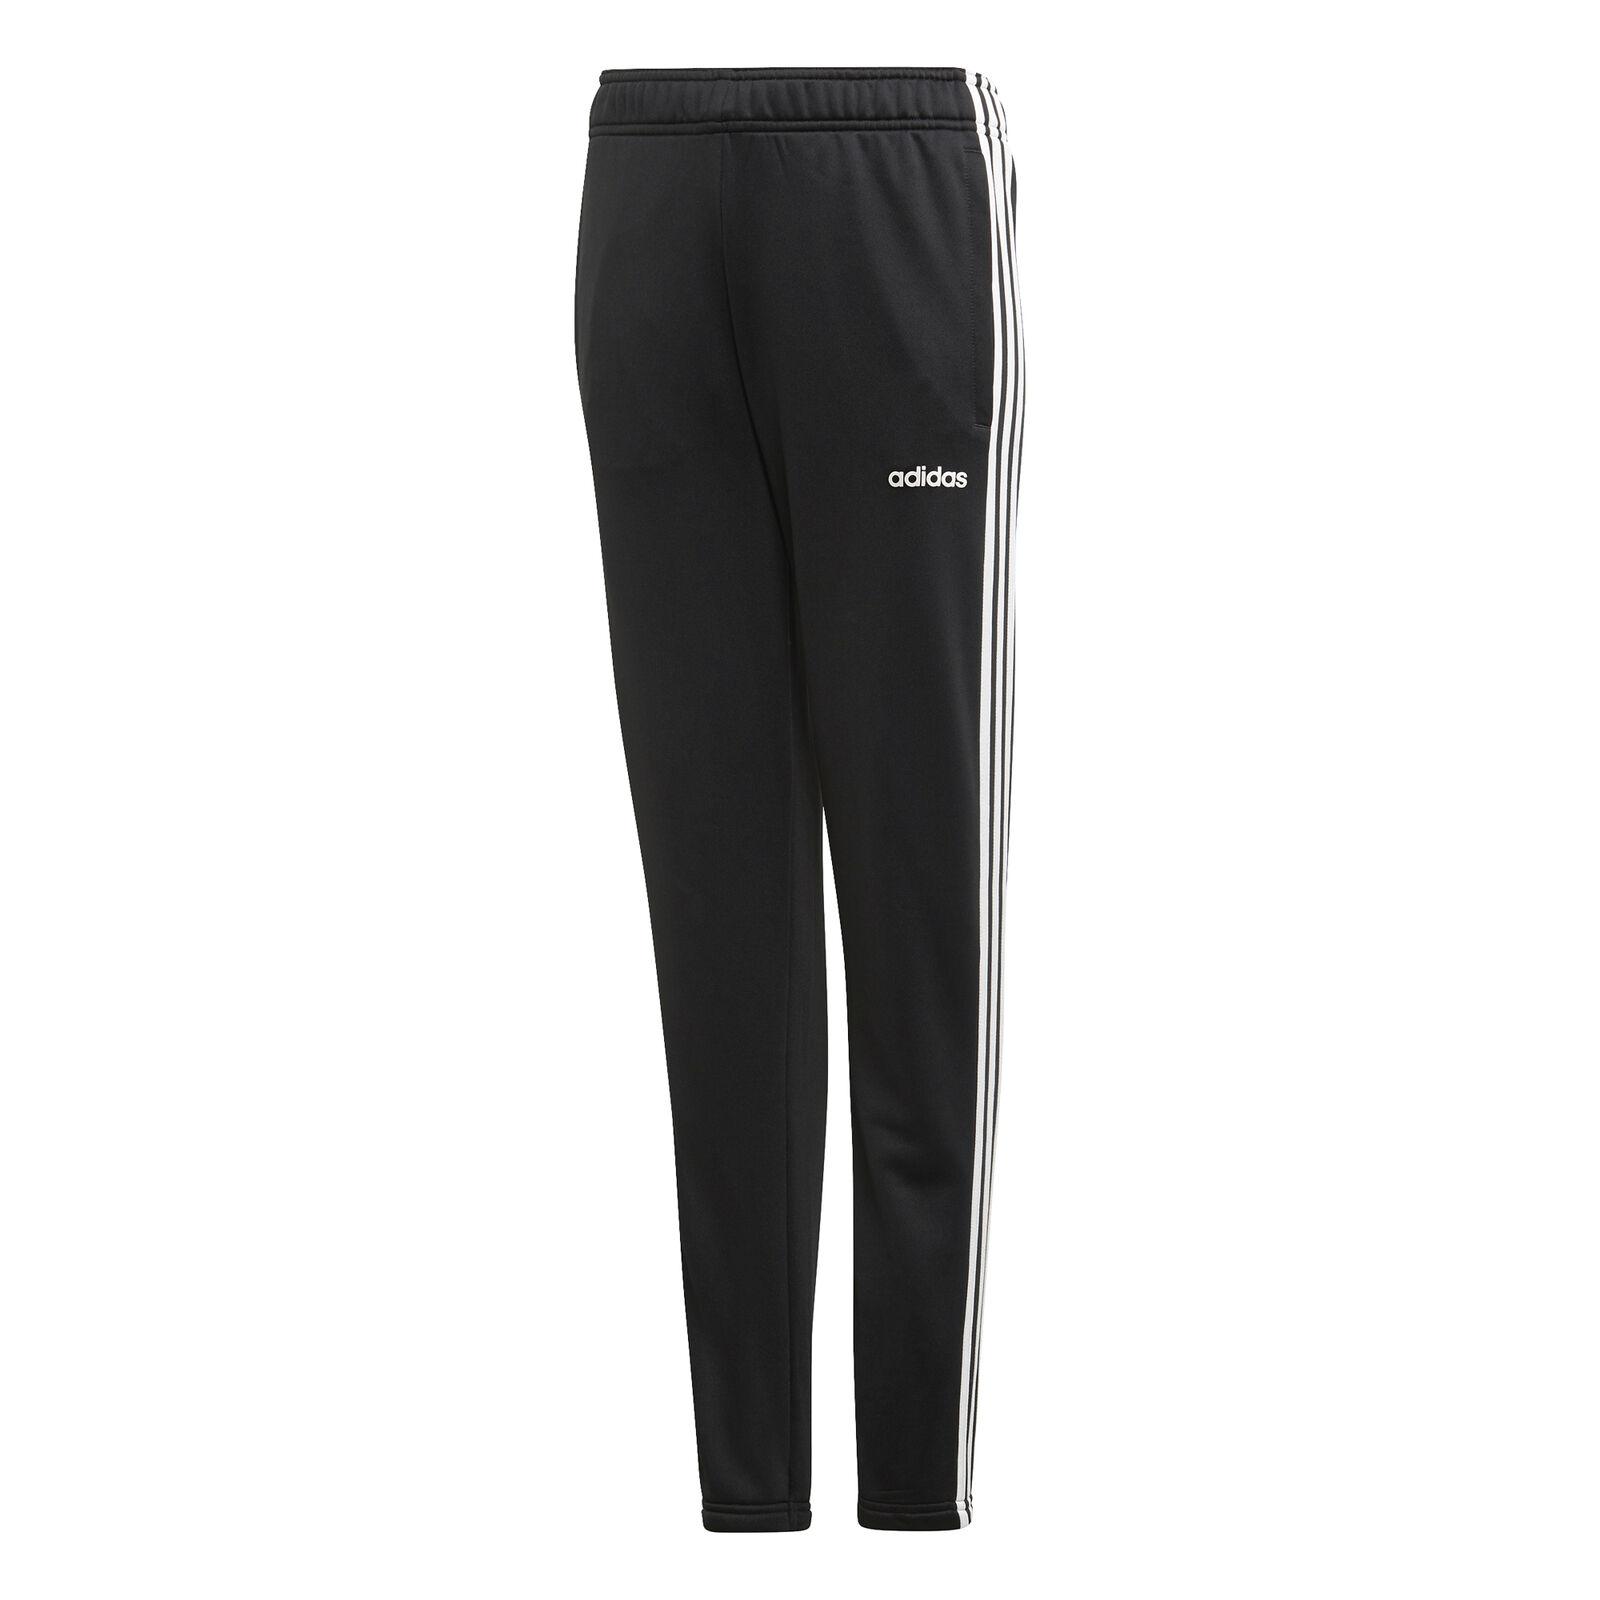 Adidas Yg C Pantaloni Bambini Fitnesshose da Jogging Sportivi